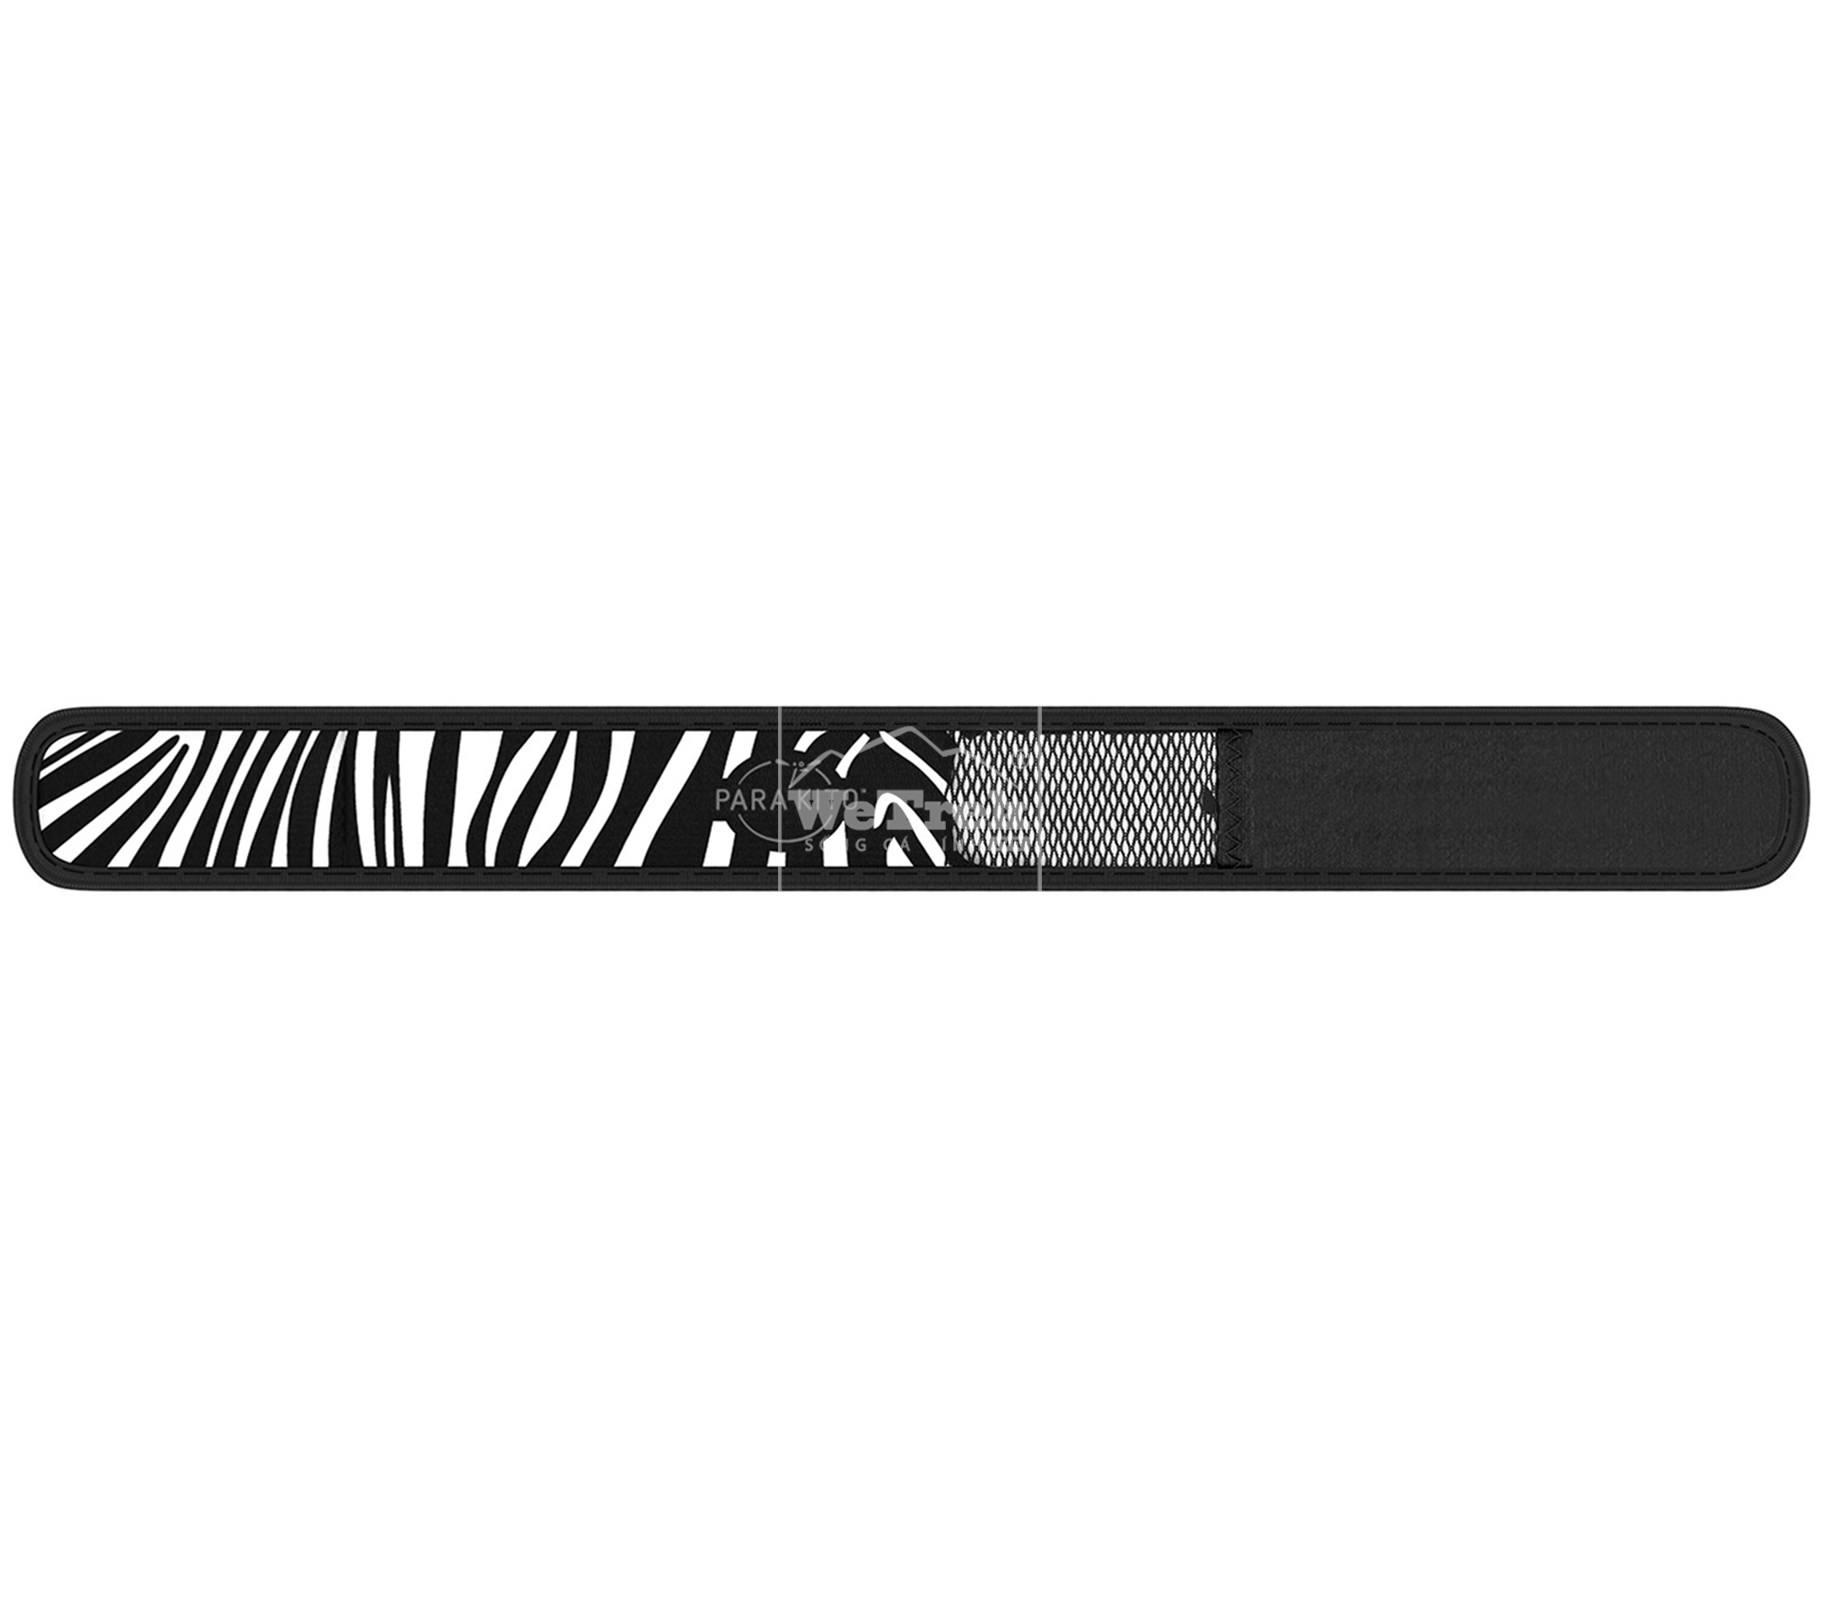 sap-chong-muoi-kem-vong-tay-parakito-zebra-band-7496-wetrek.vn-2